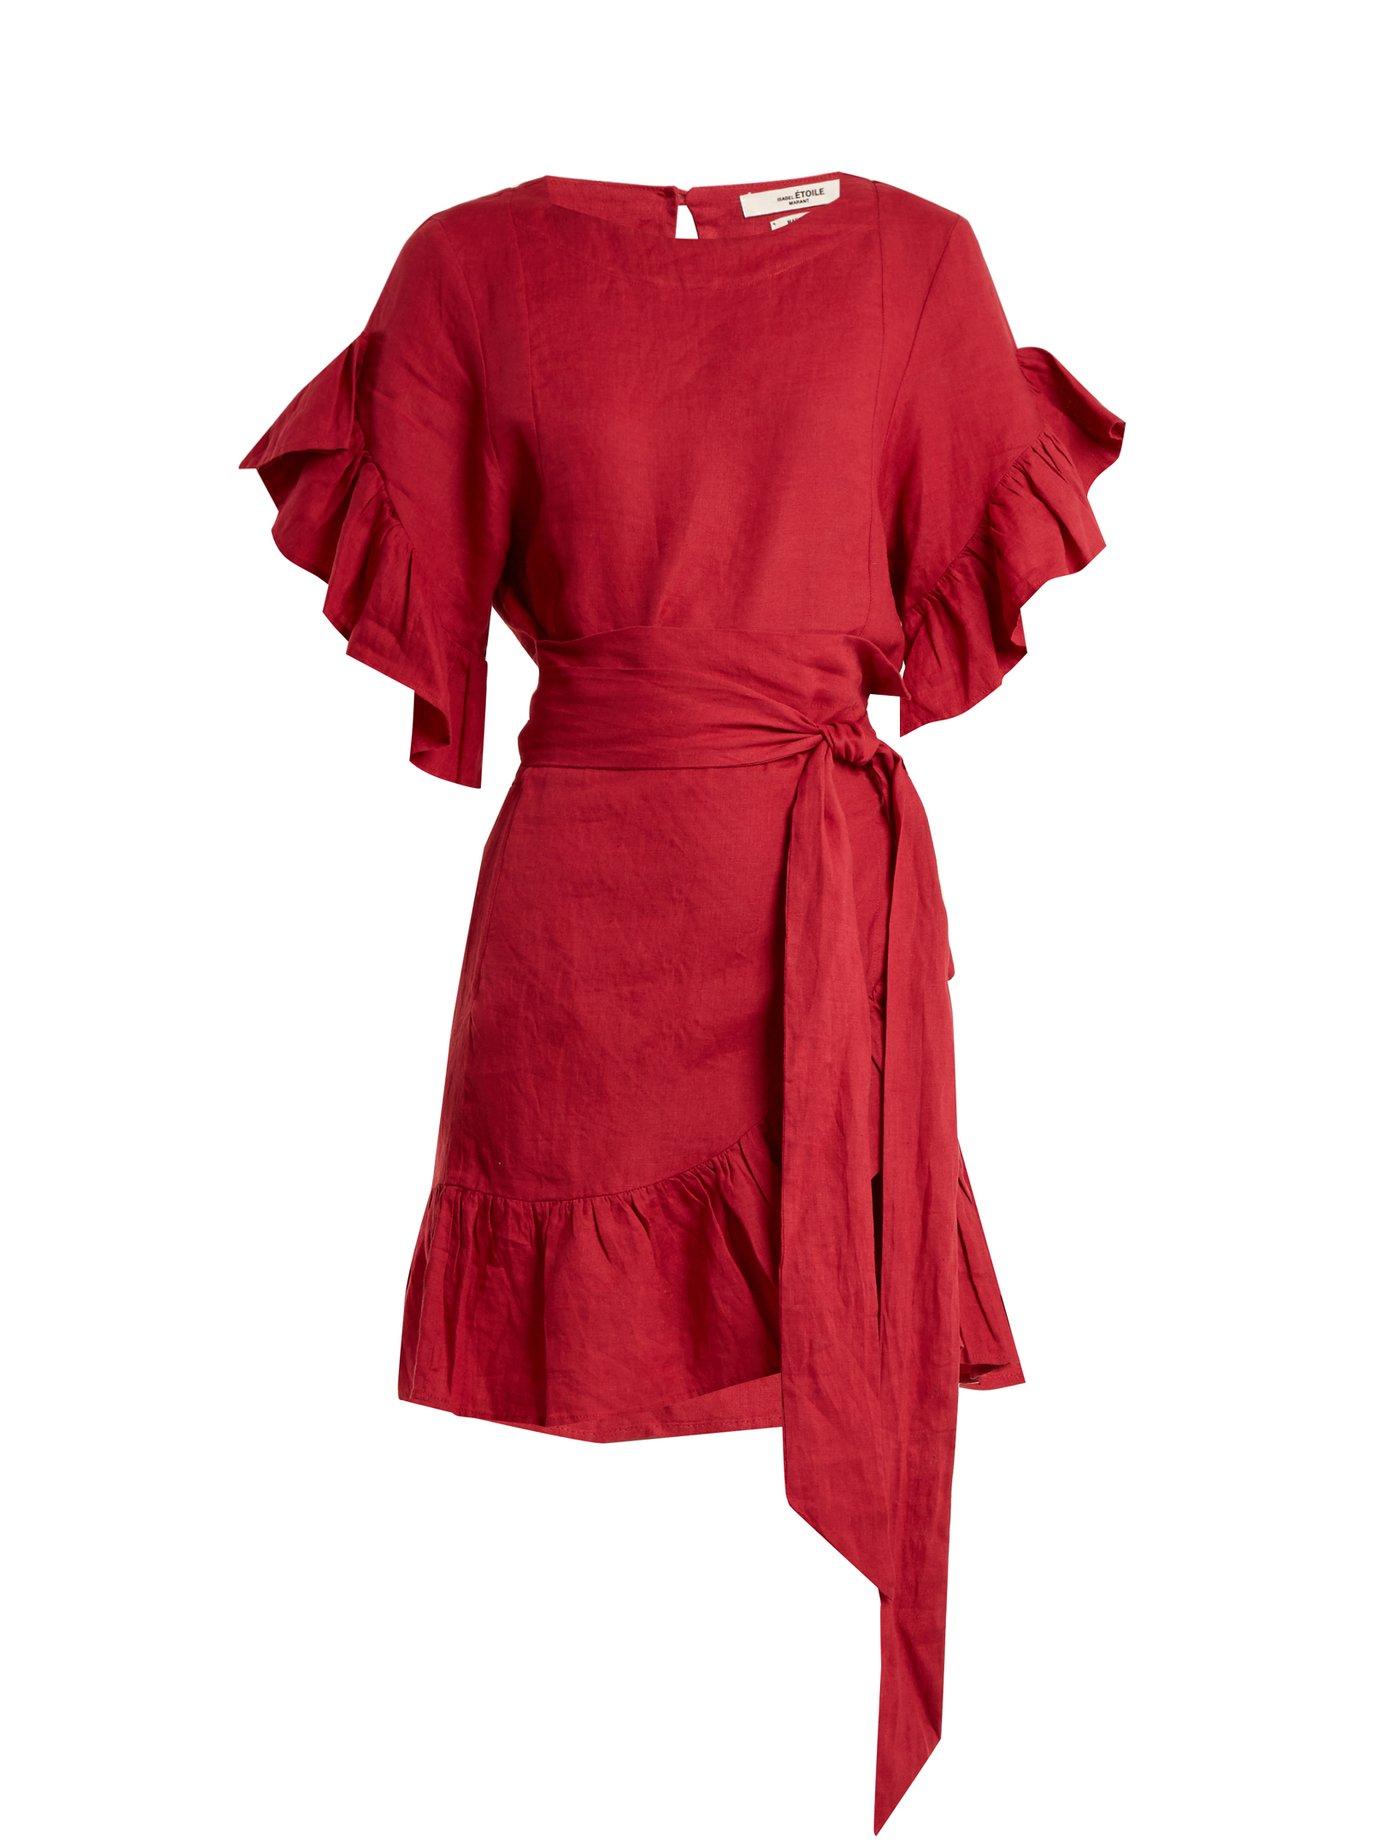 a75d487a31b Isabel Marant Étoile - Delicia Ruffle-Trimmed Linen Wrap Dress - Red ...